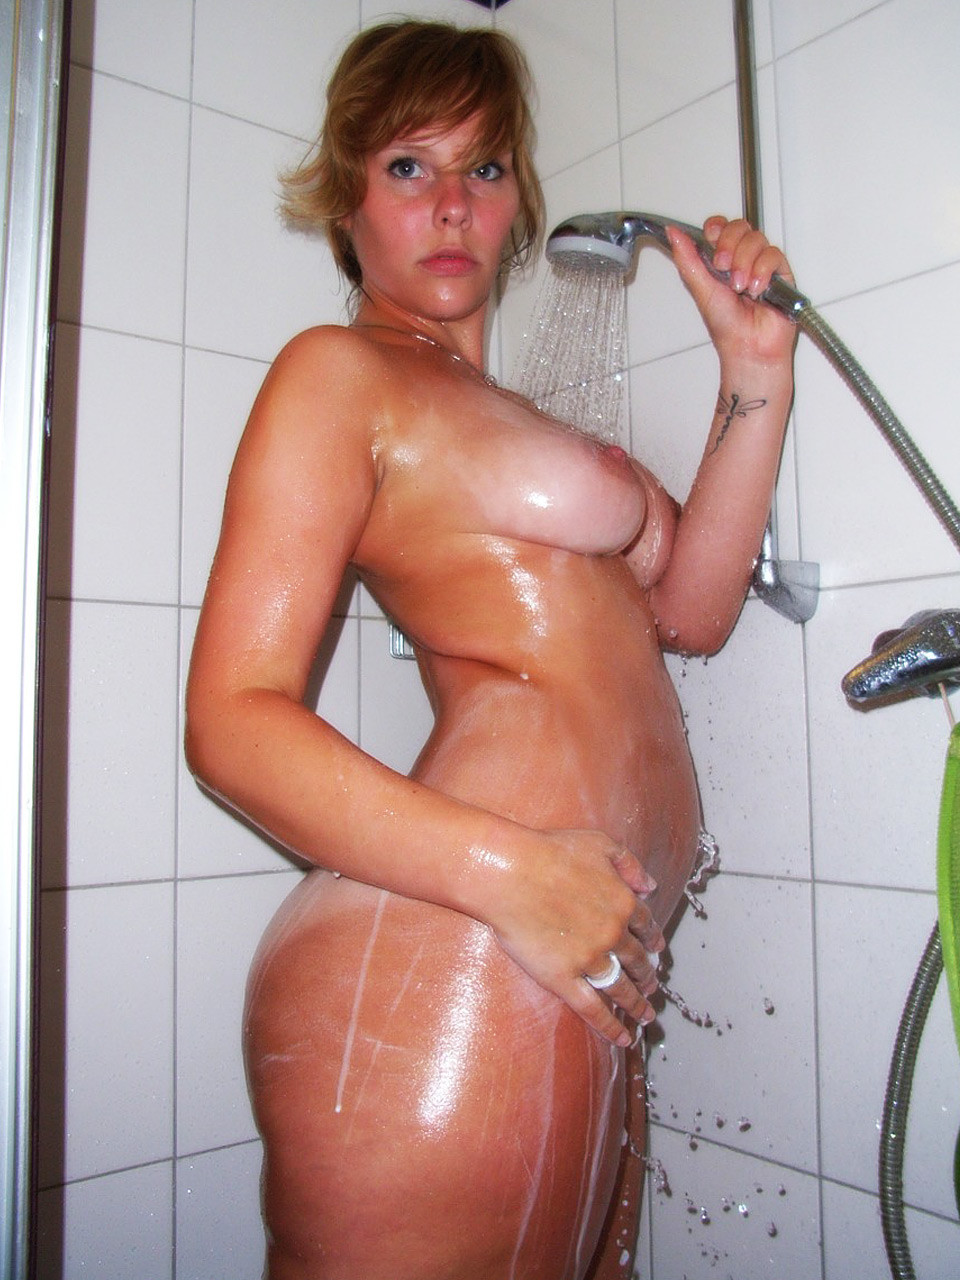 anonymous nude girlfriend pics